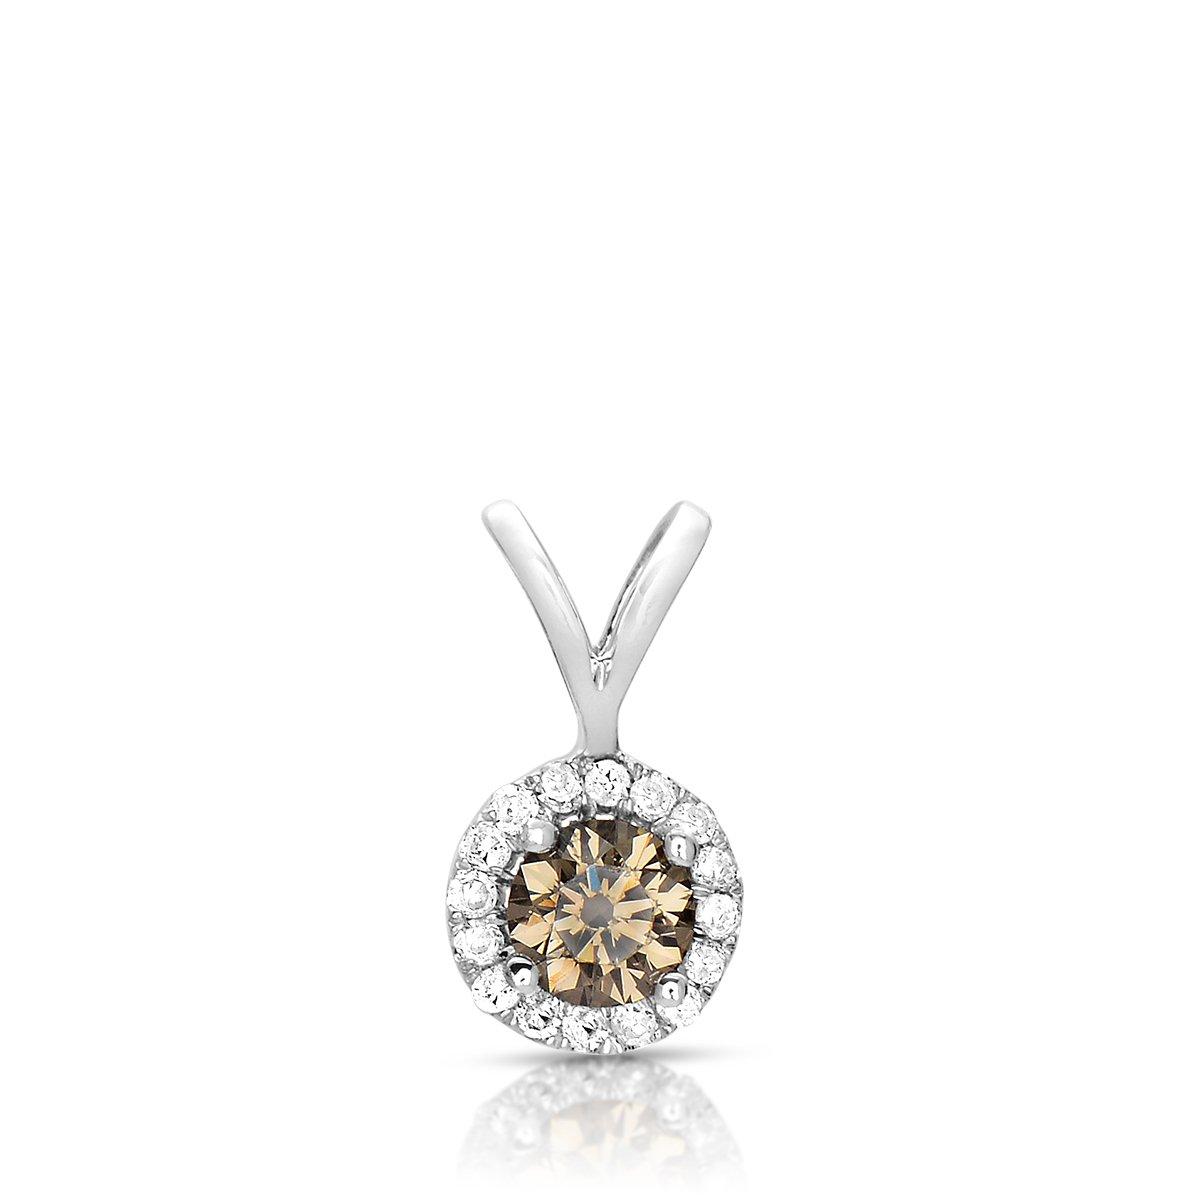 0.50 ct Chocolate Brown Diamond Halo 14k White Gold Pendant Necklace Set (K1295-050WBR)